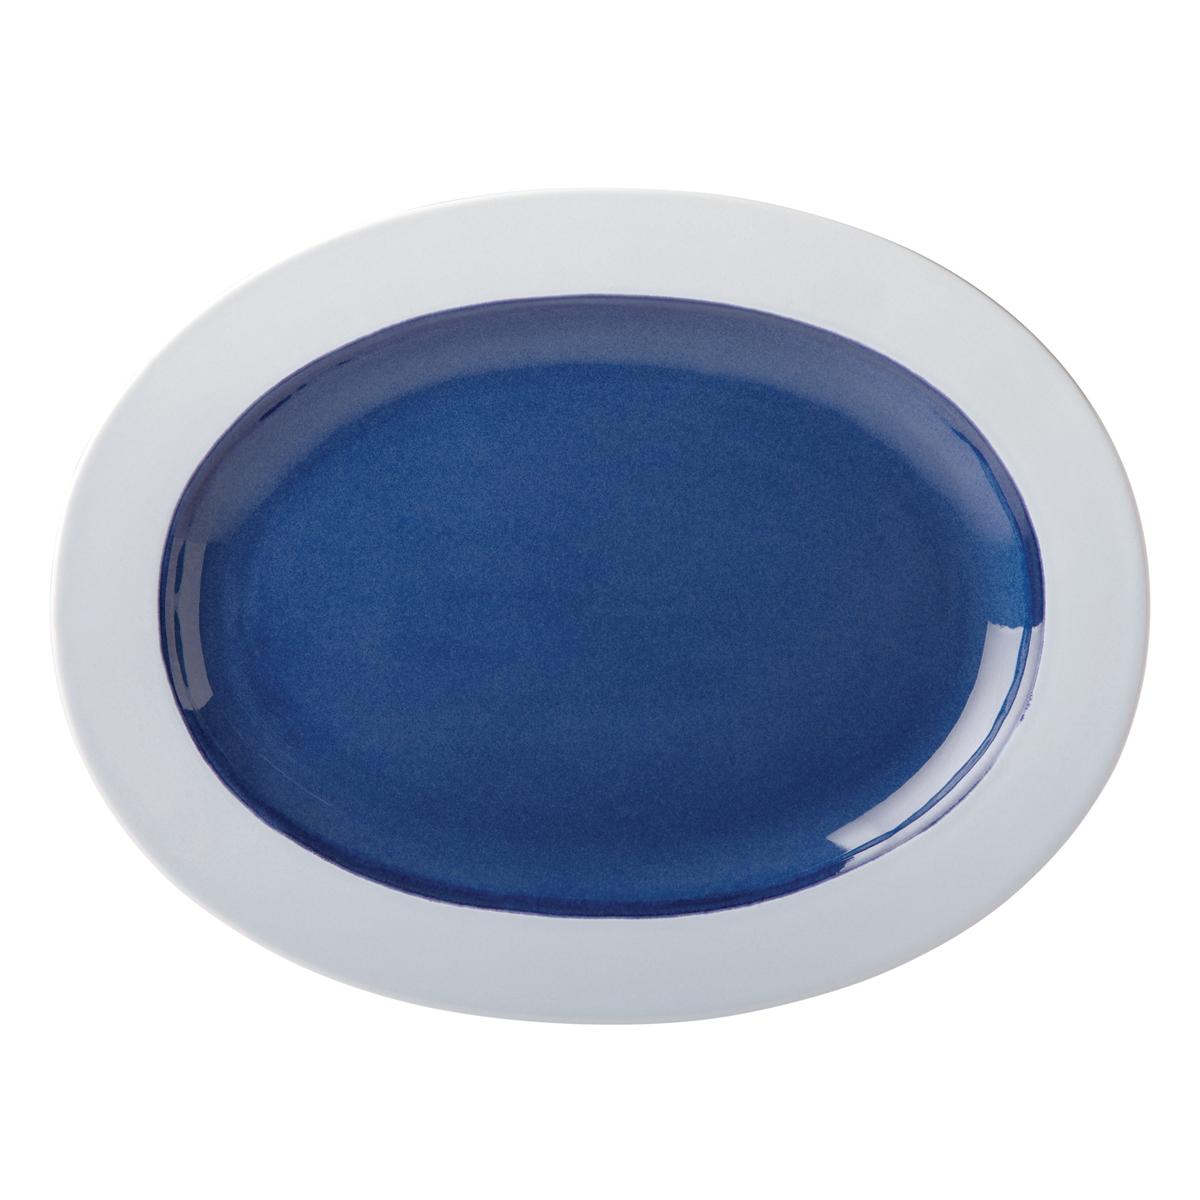 Kate Spade China by Lenox, Stoneware Nolita Blue Platter